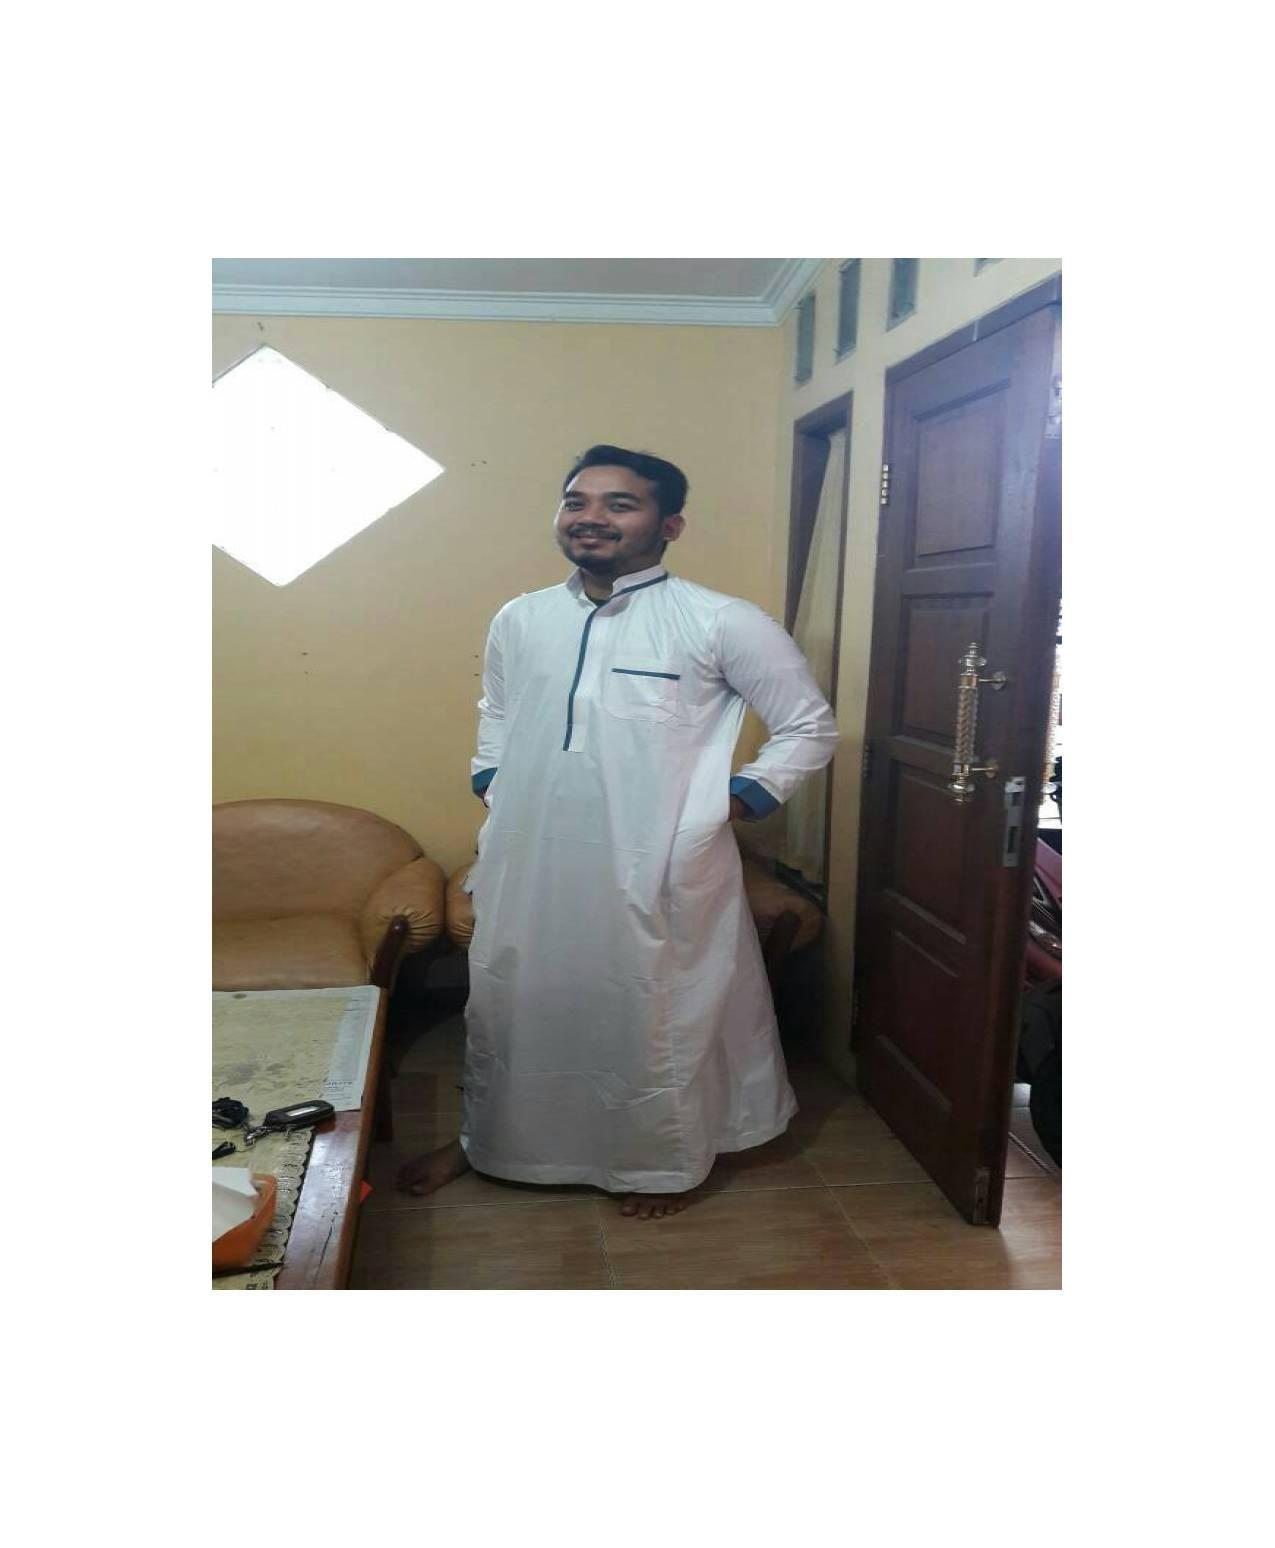 fe9f992322d6239345210600a33f6891 Kumpulan Daftar Harga Gamis Modern Ala Hijabers Terbaru bulan ini